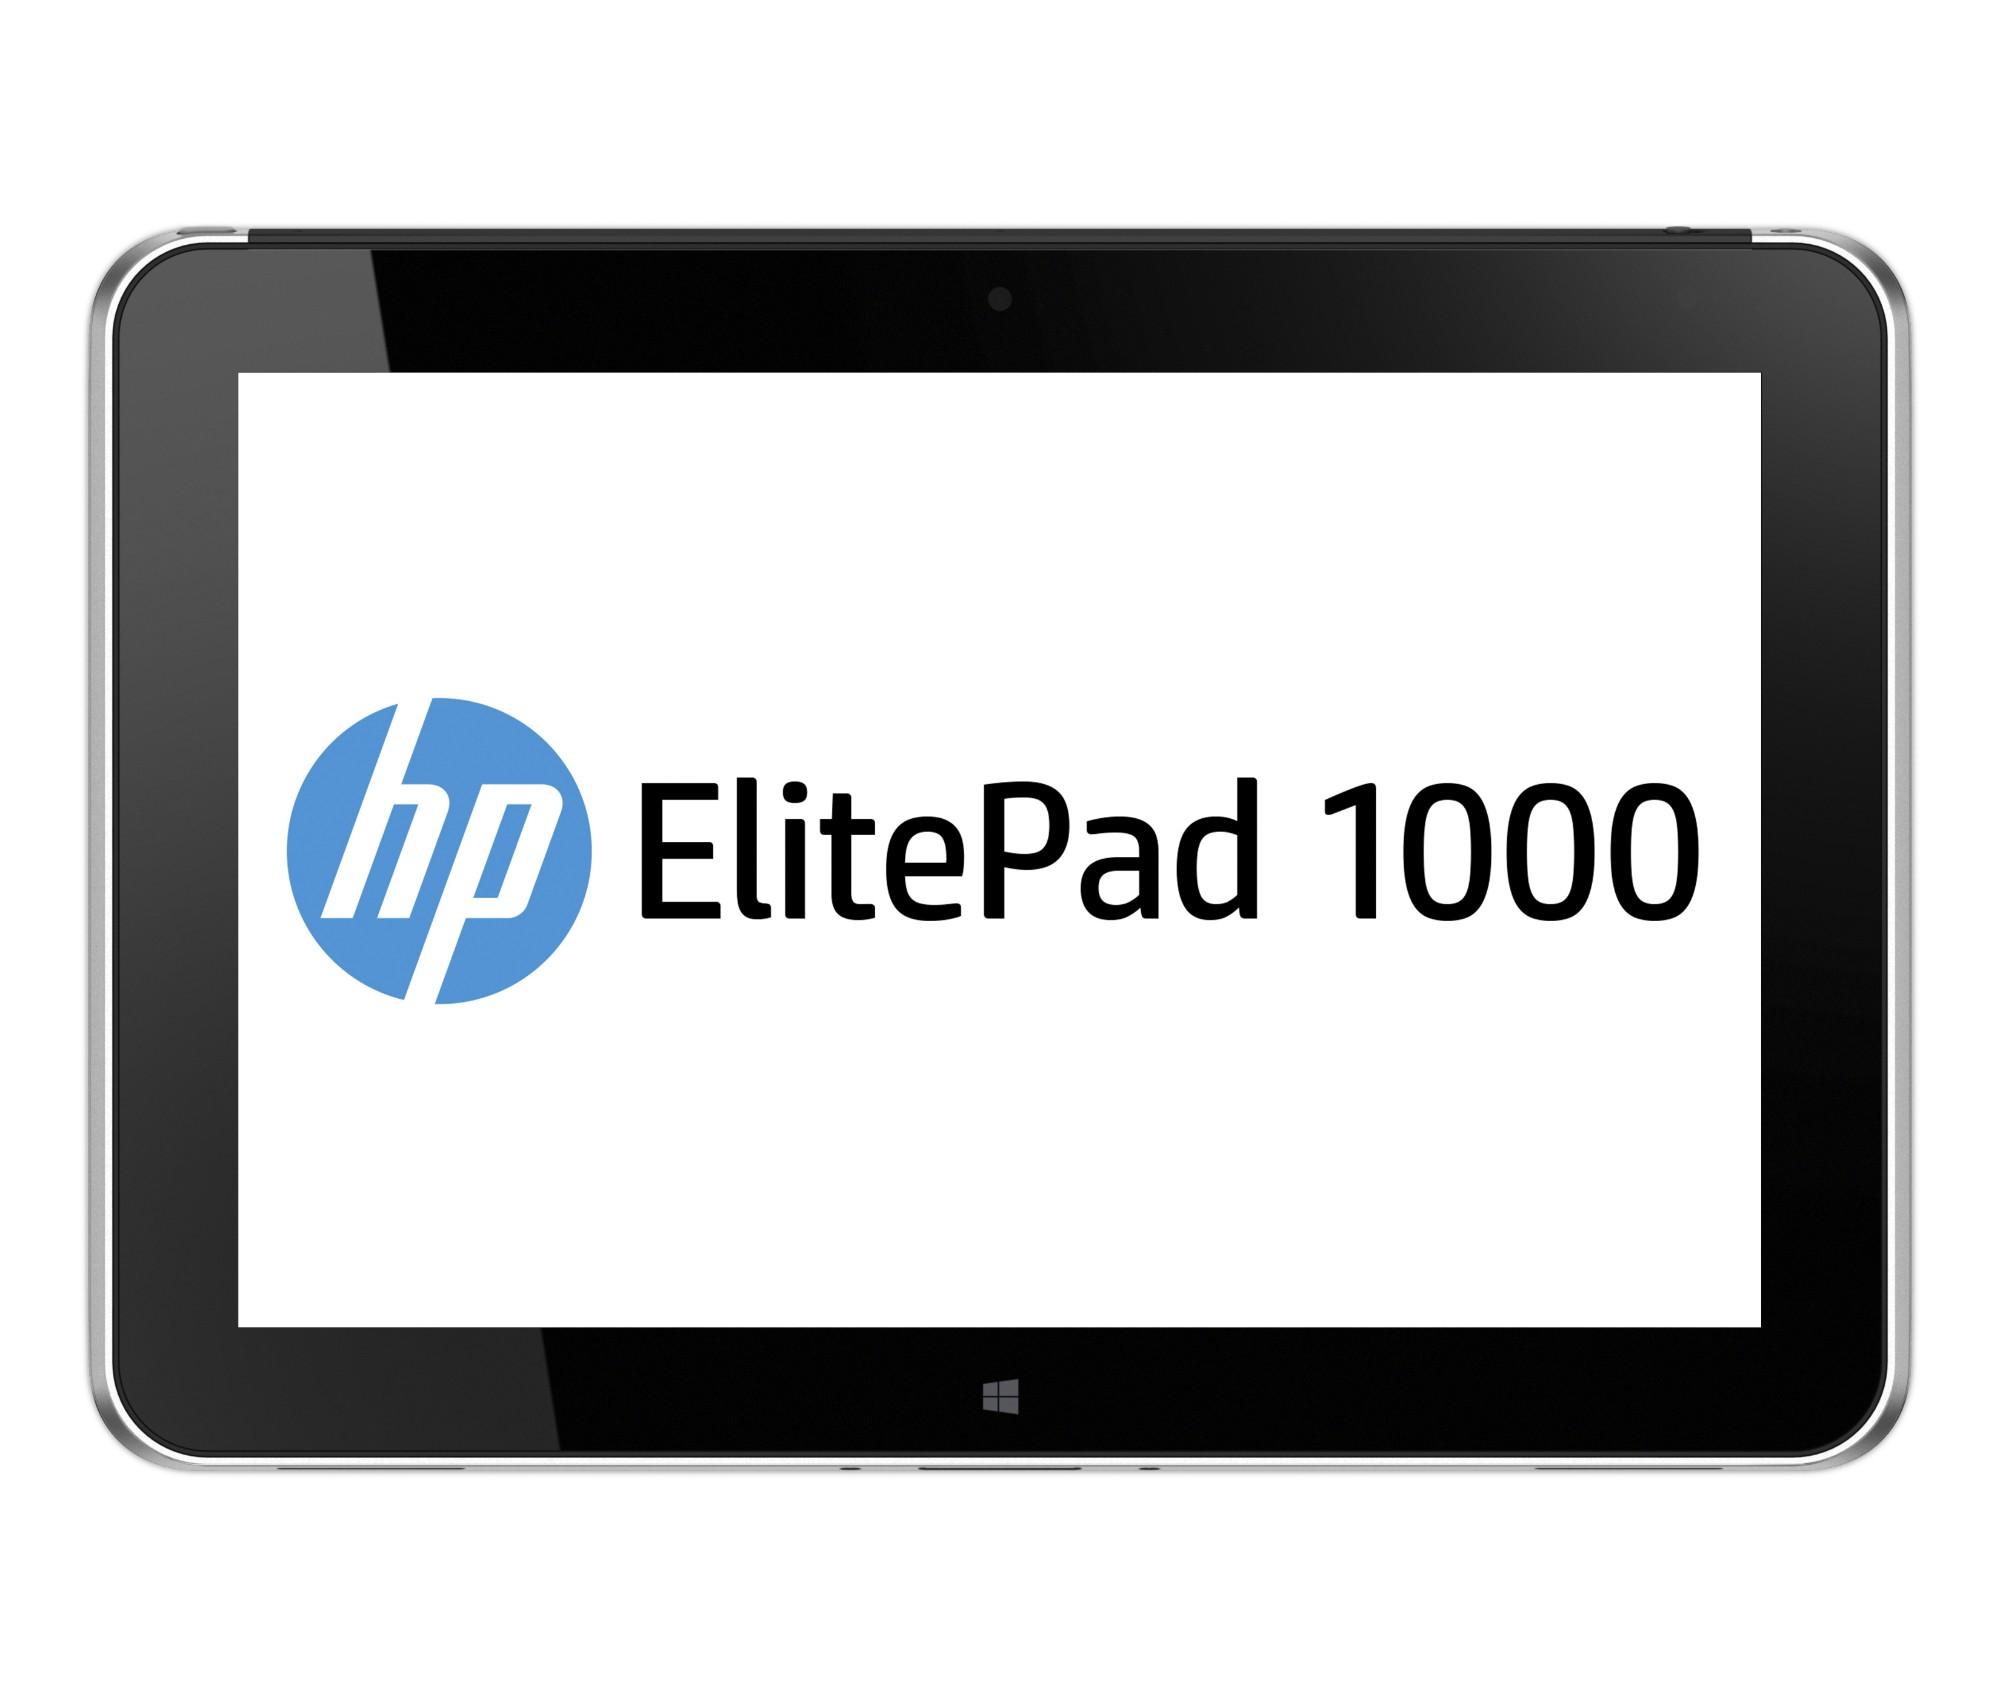 HP ElitePad 1000 G2 64GB Silver tablet